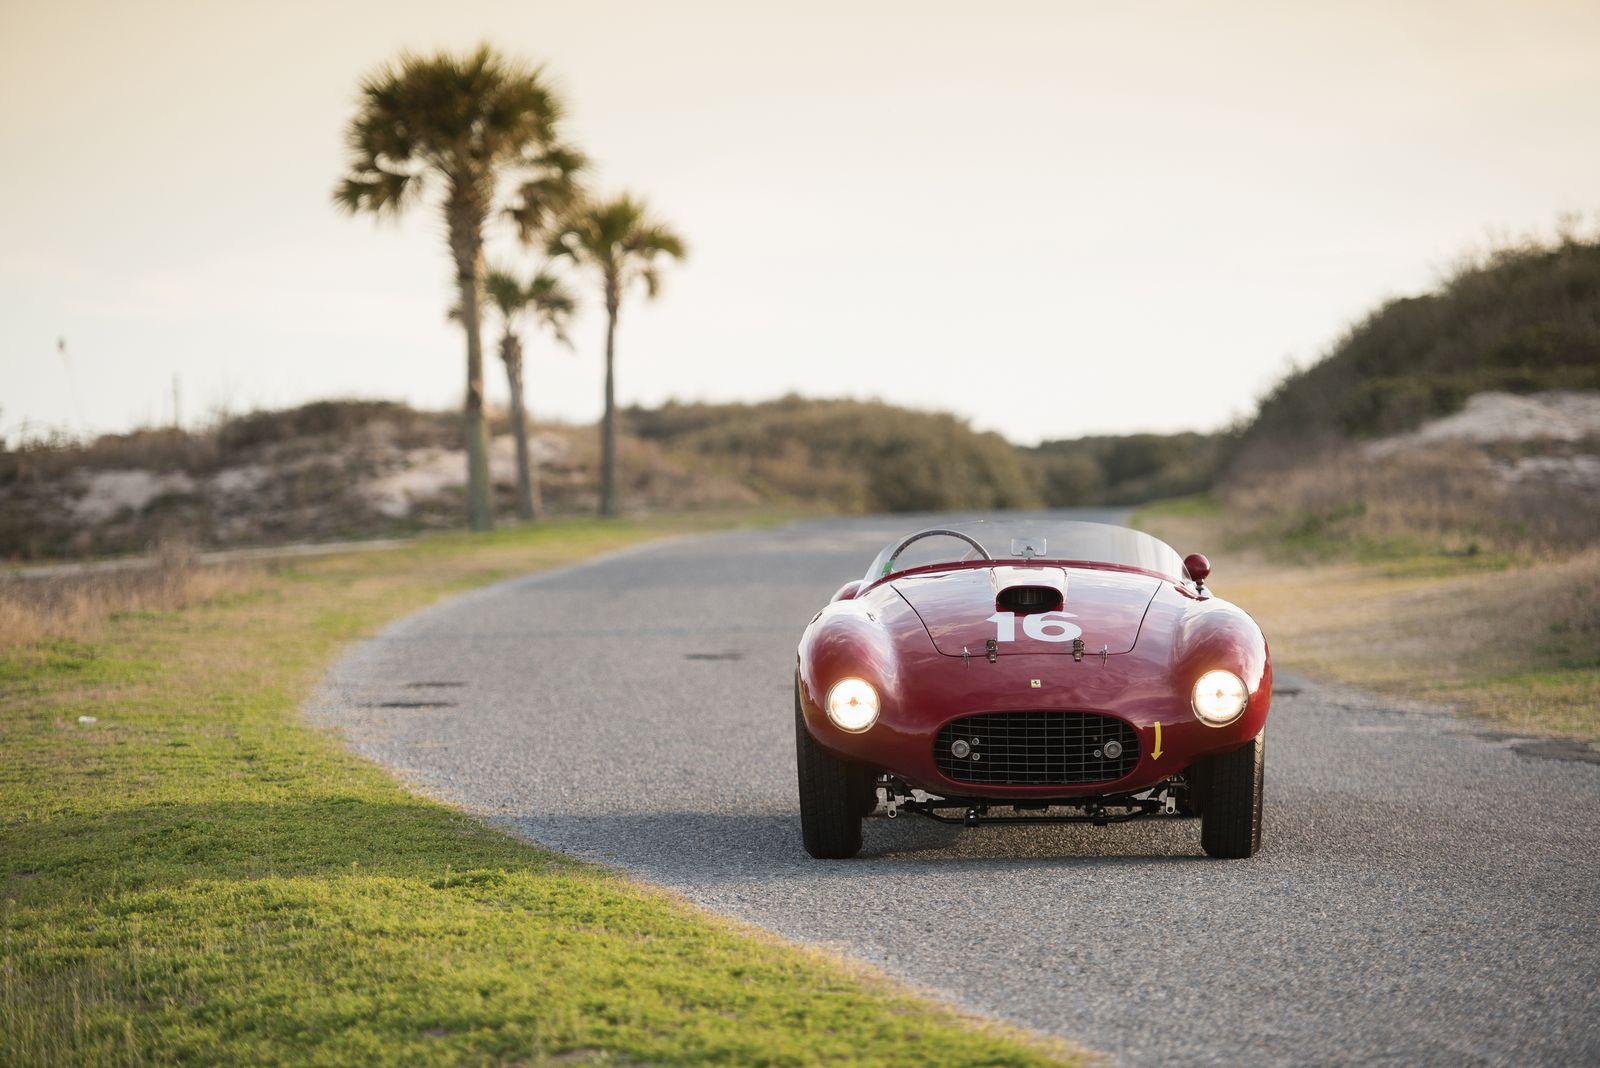 1950 Ferrari 275S 340 America Barchetta Goes To AUCTION For $10 Million 11